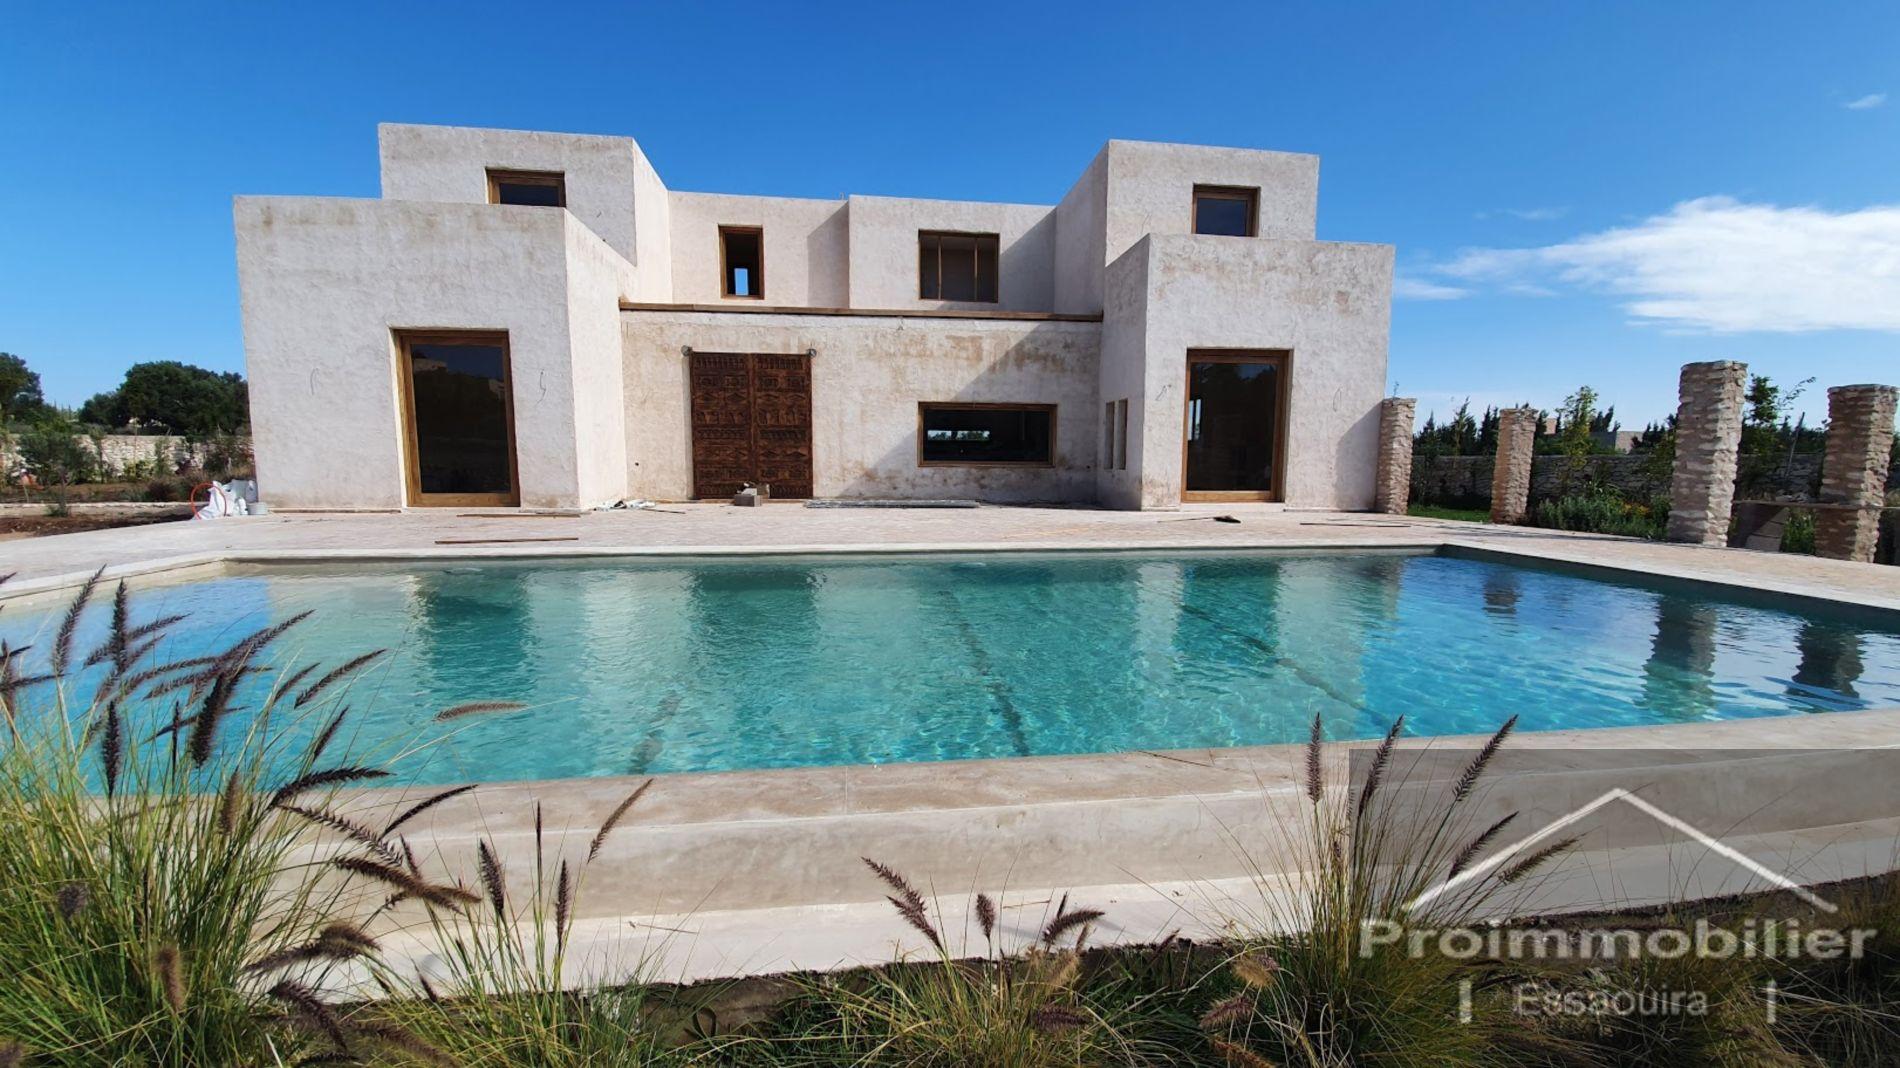 21-03-13-VM Wonderful House of 270m², Land of 3000m² without AVNA